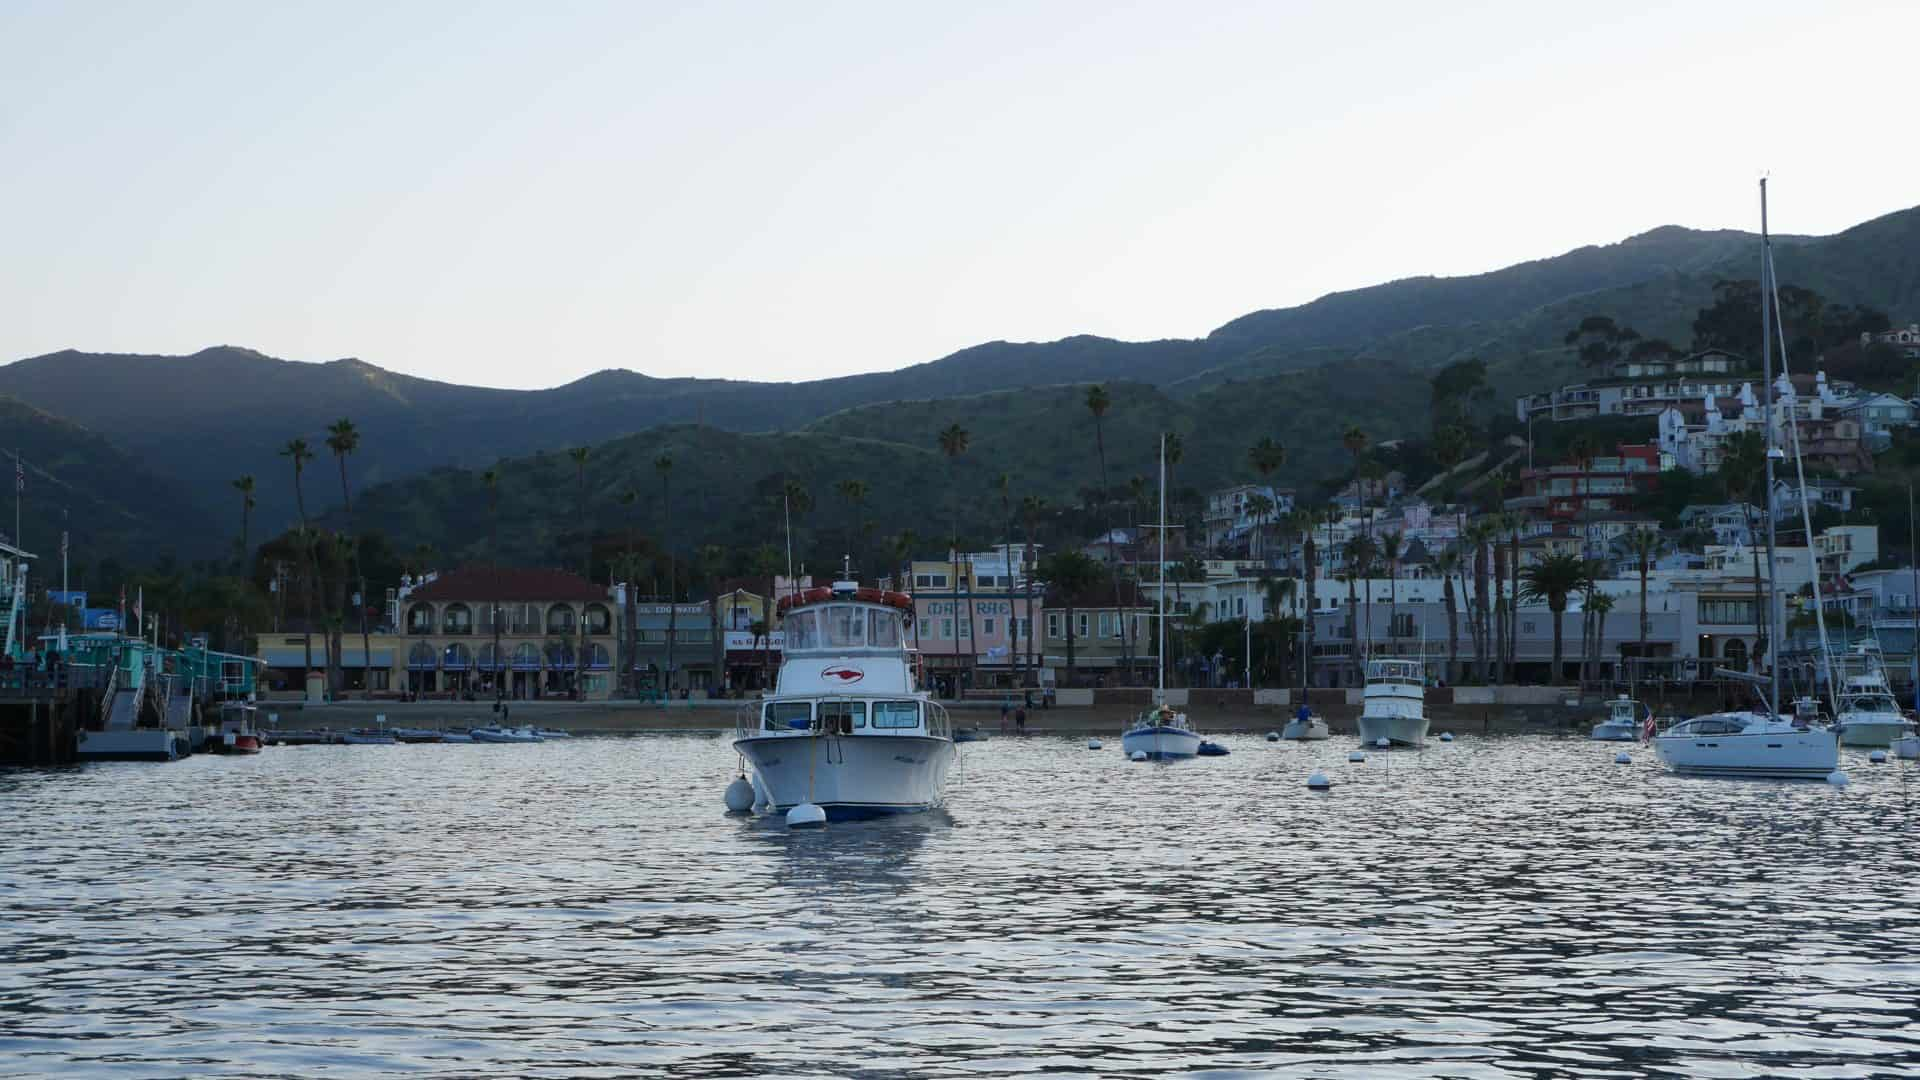 Avalon, Catalina Islands, California, view from boat